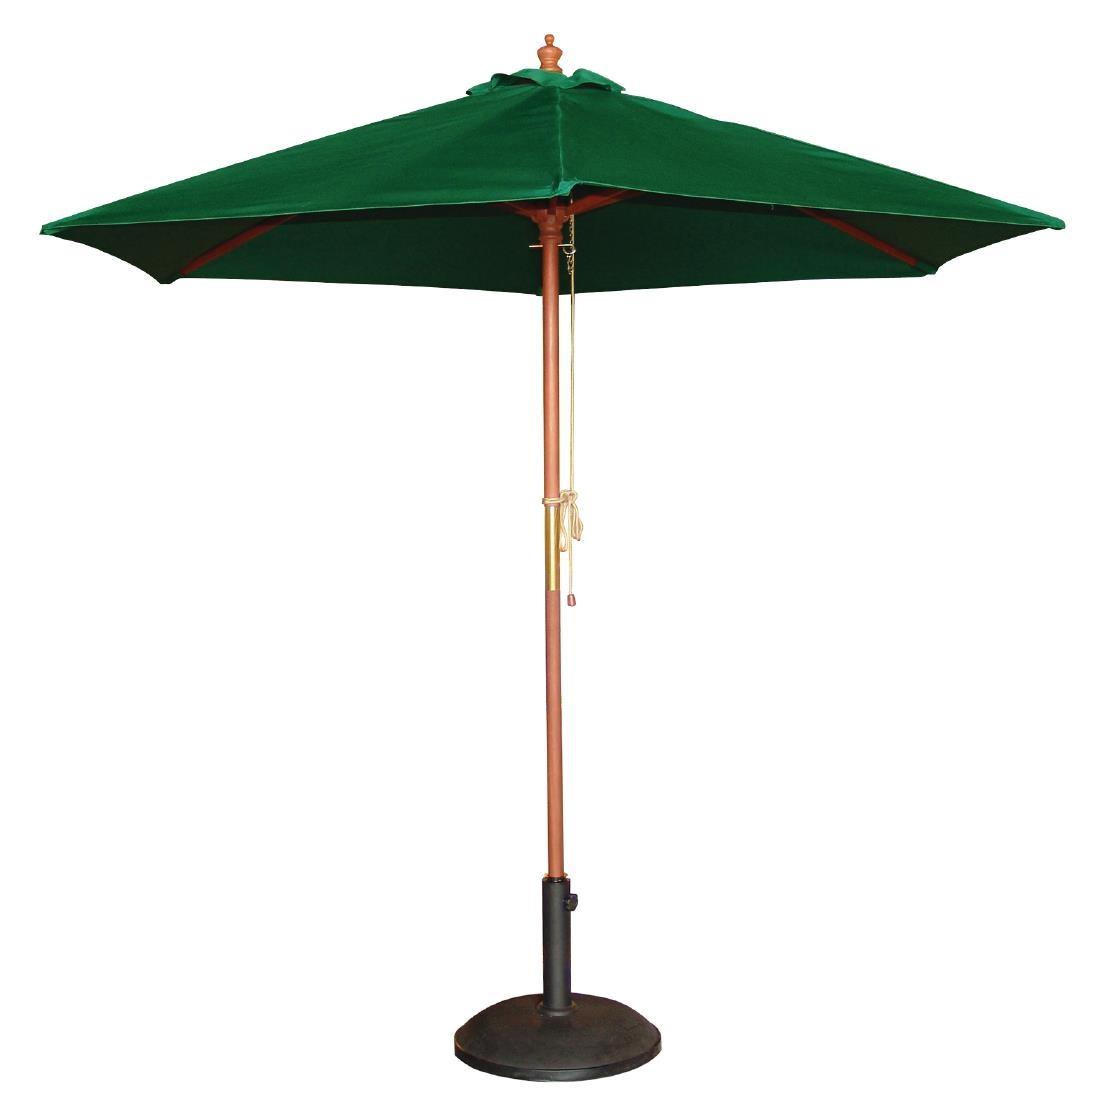 Parasol - Green